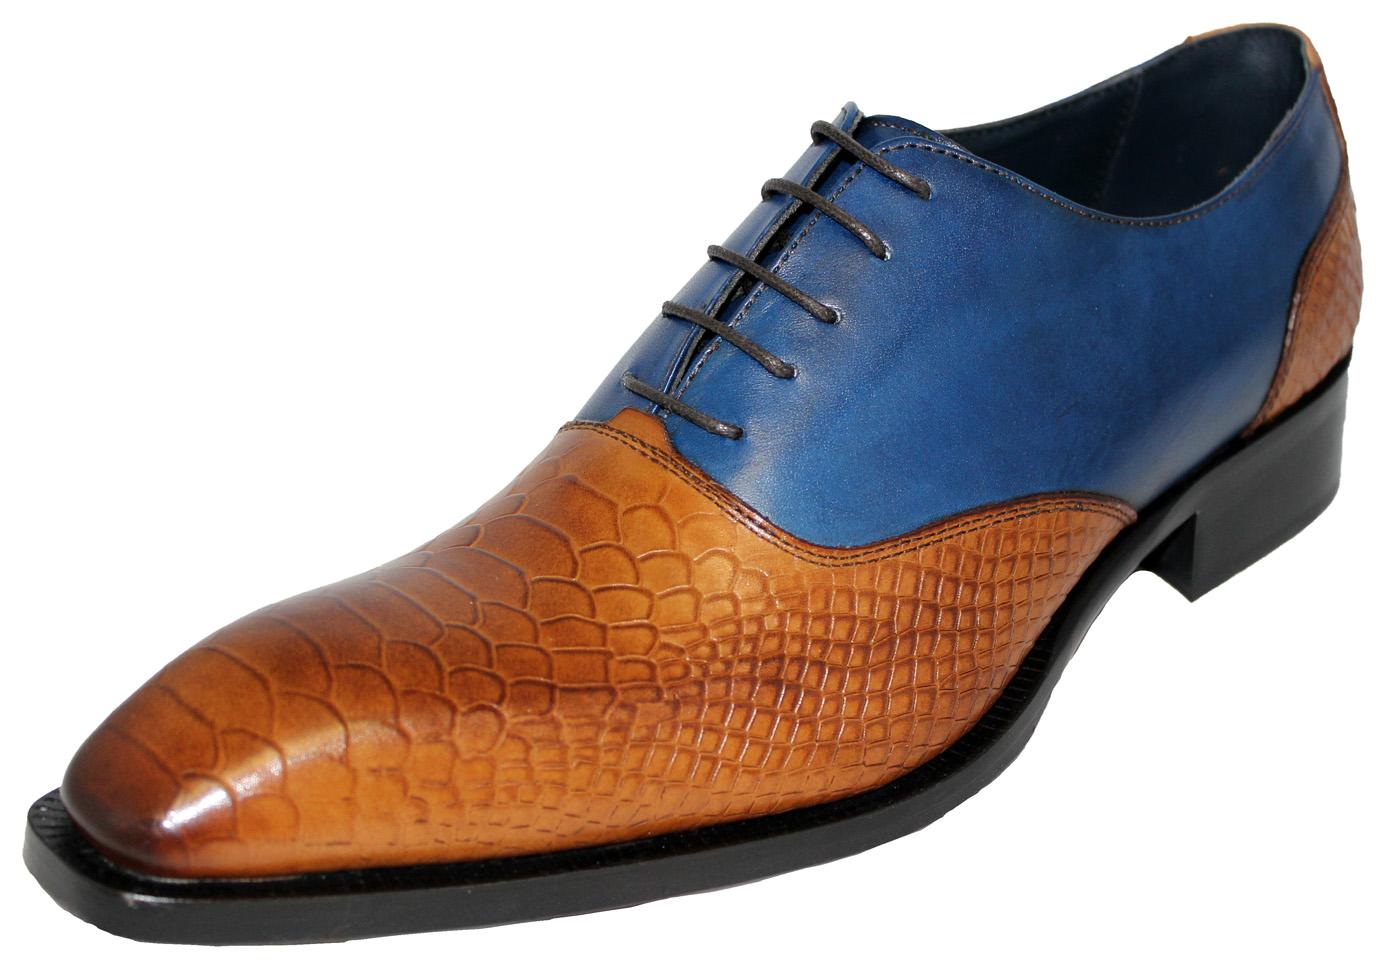 Duca Di Matiste 12 Blue Genuine Italian Calfskin Cognac Snake Print Leather Shoes